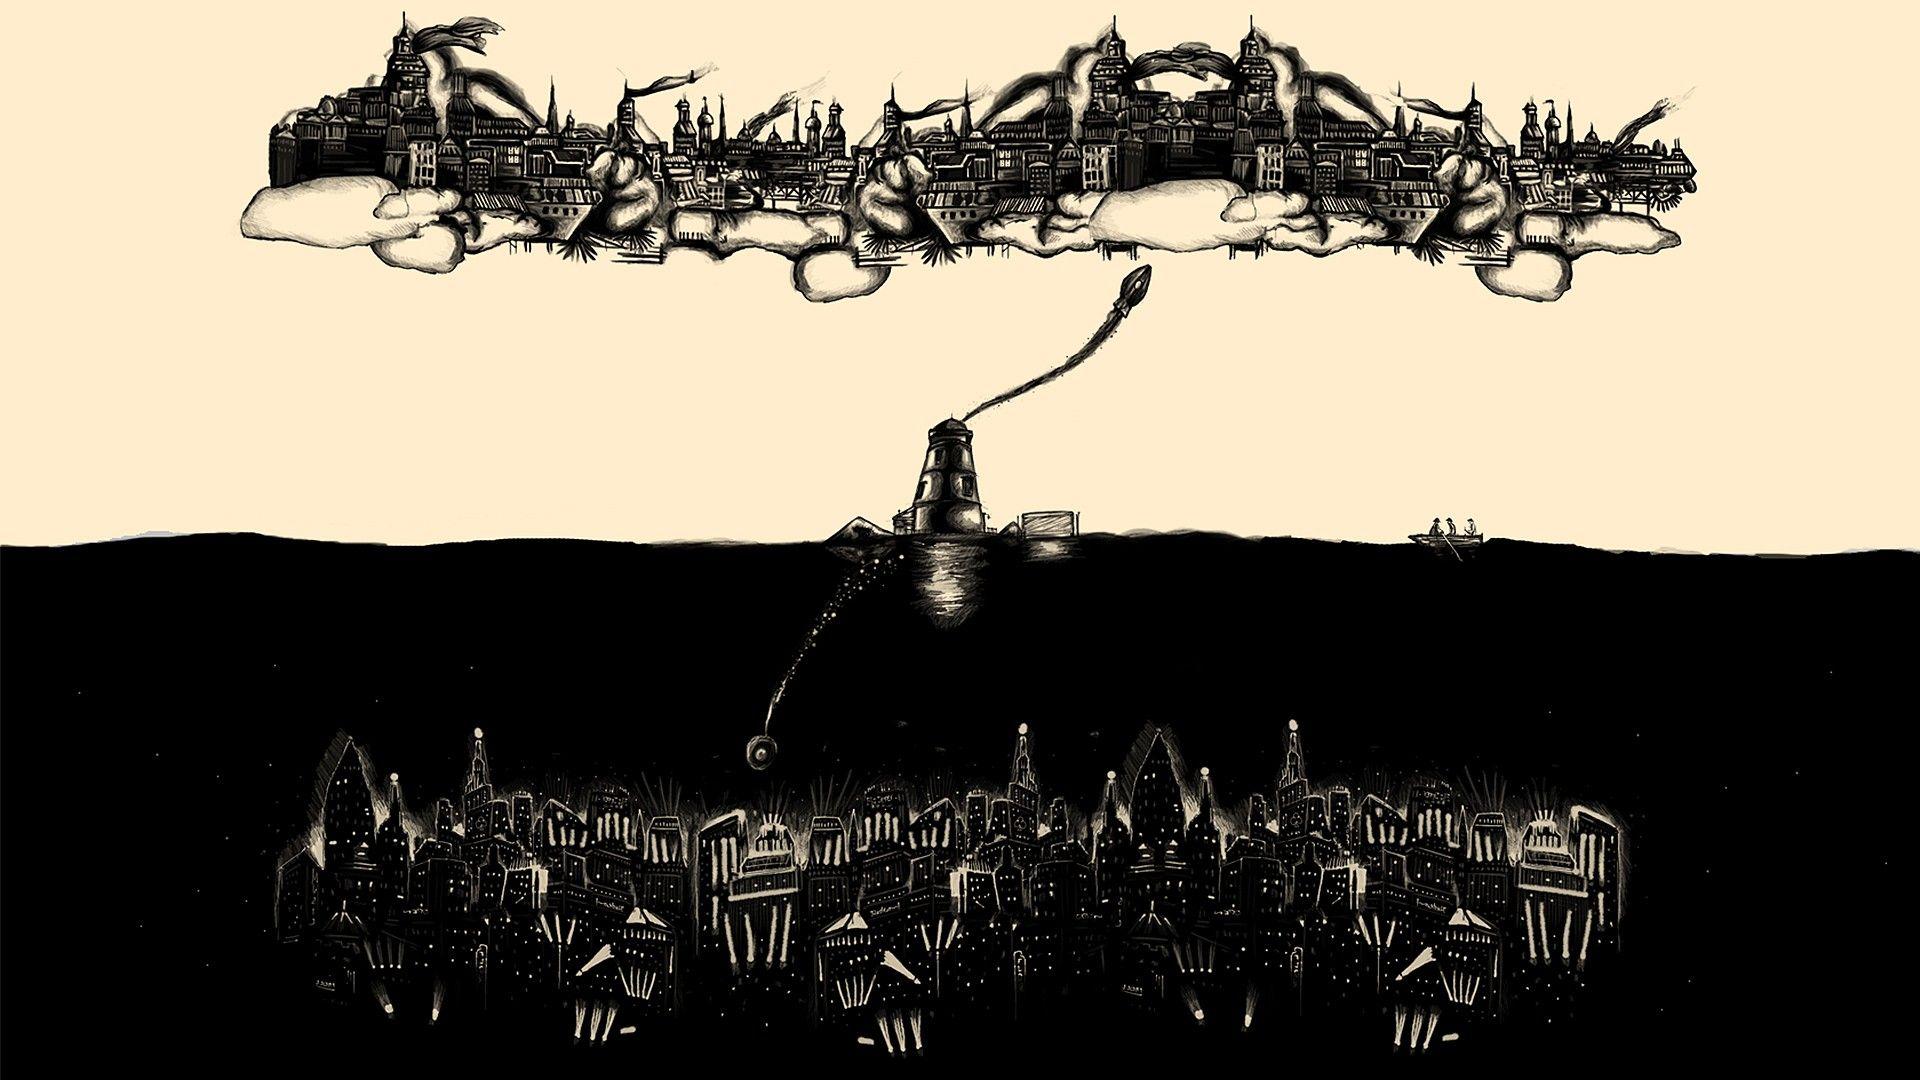 BioShock Rapture Wallpapers Group (72+)